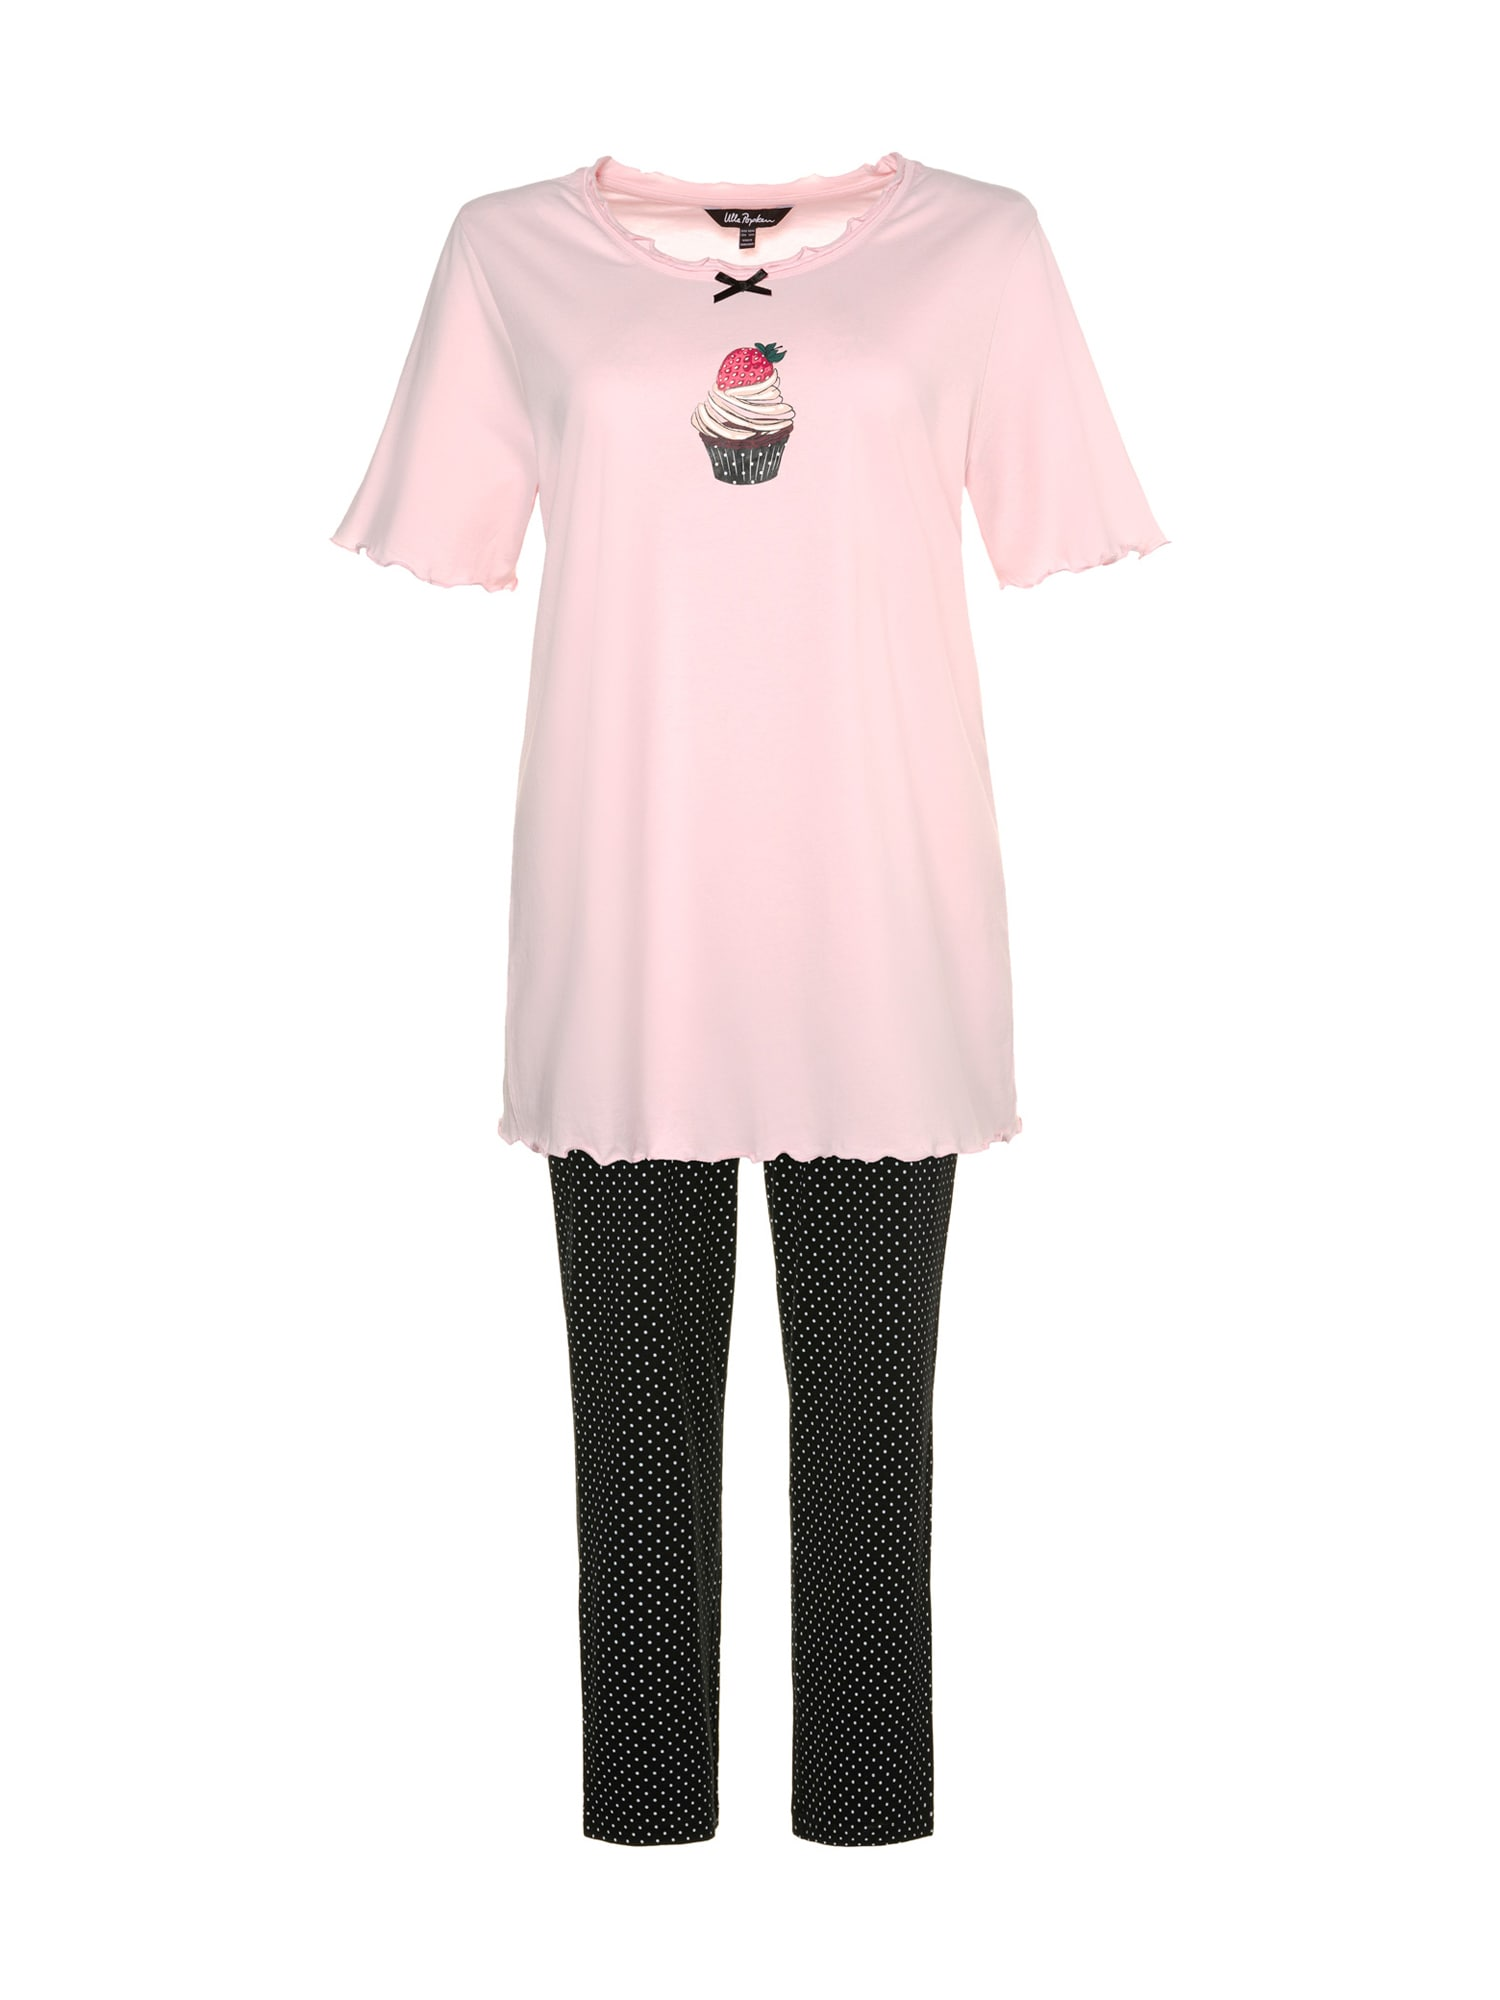 Pyjama 'Cupcake' | Bekleidung > Nachtwäsche > Pyjamas | Ulla Popken